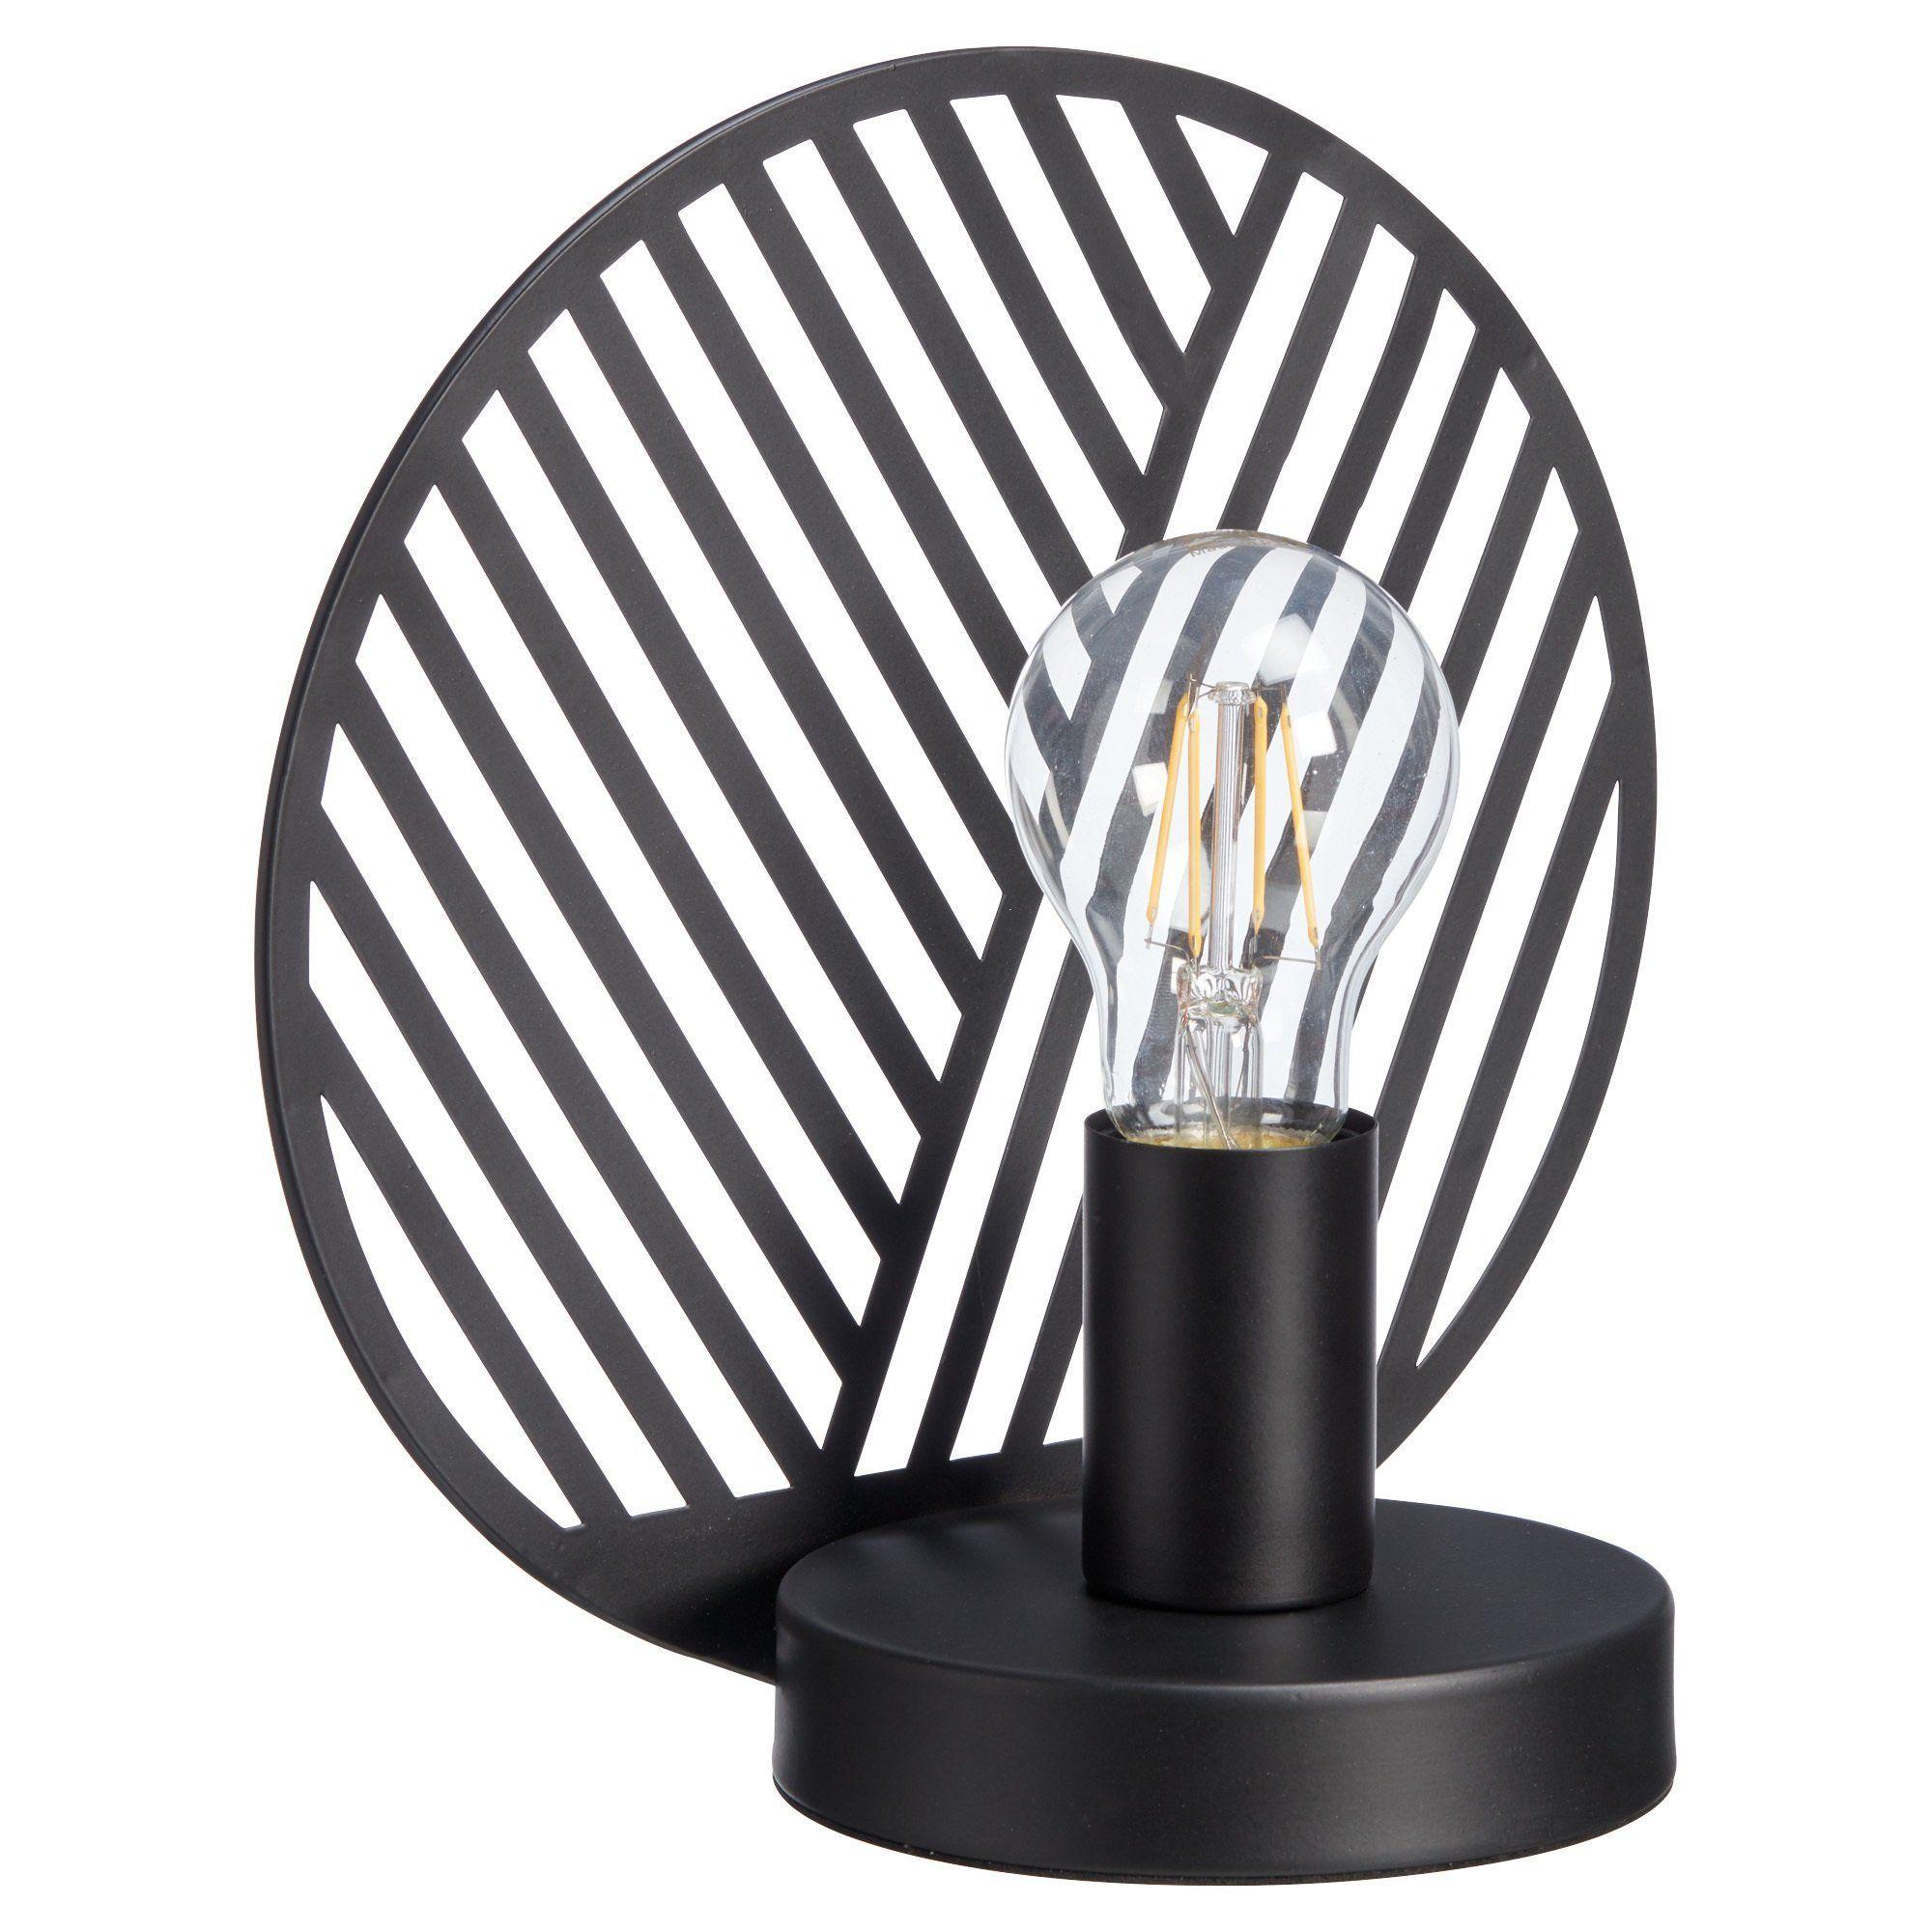 Tafellamp Soran Zwart Kwantum Home Appliances Interior